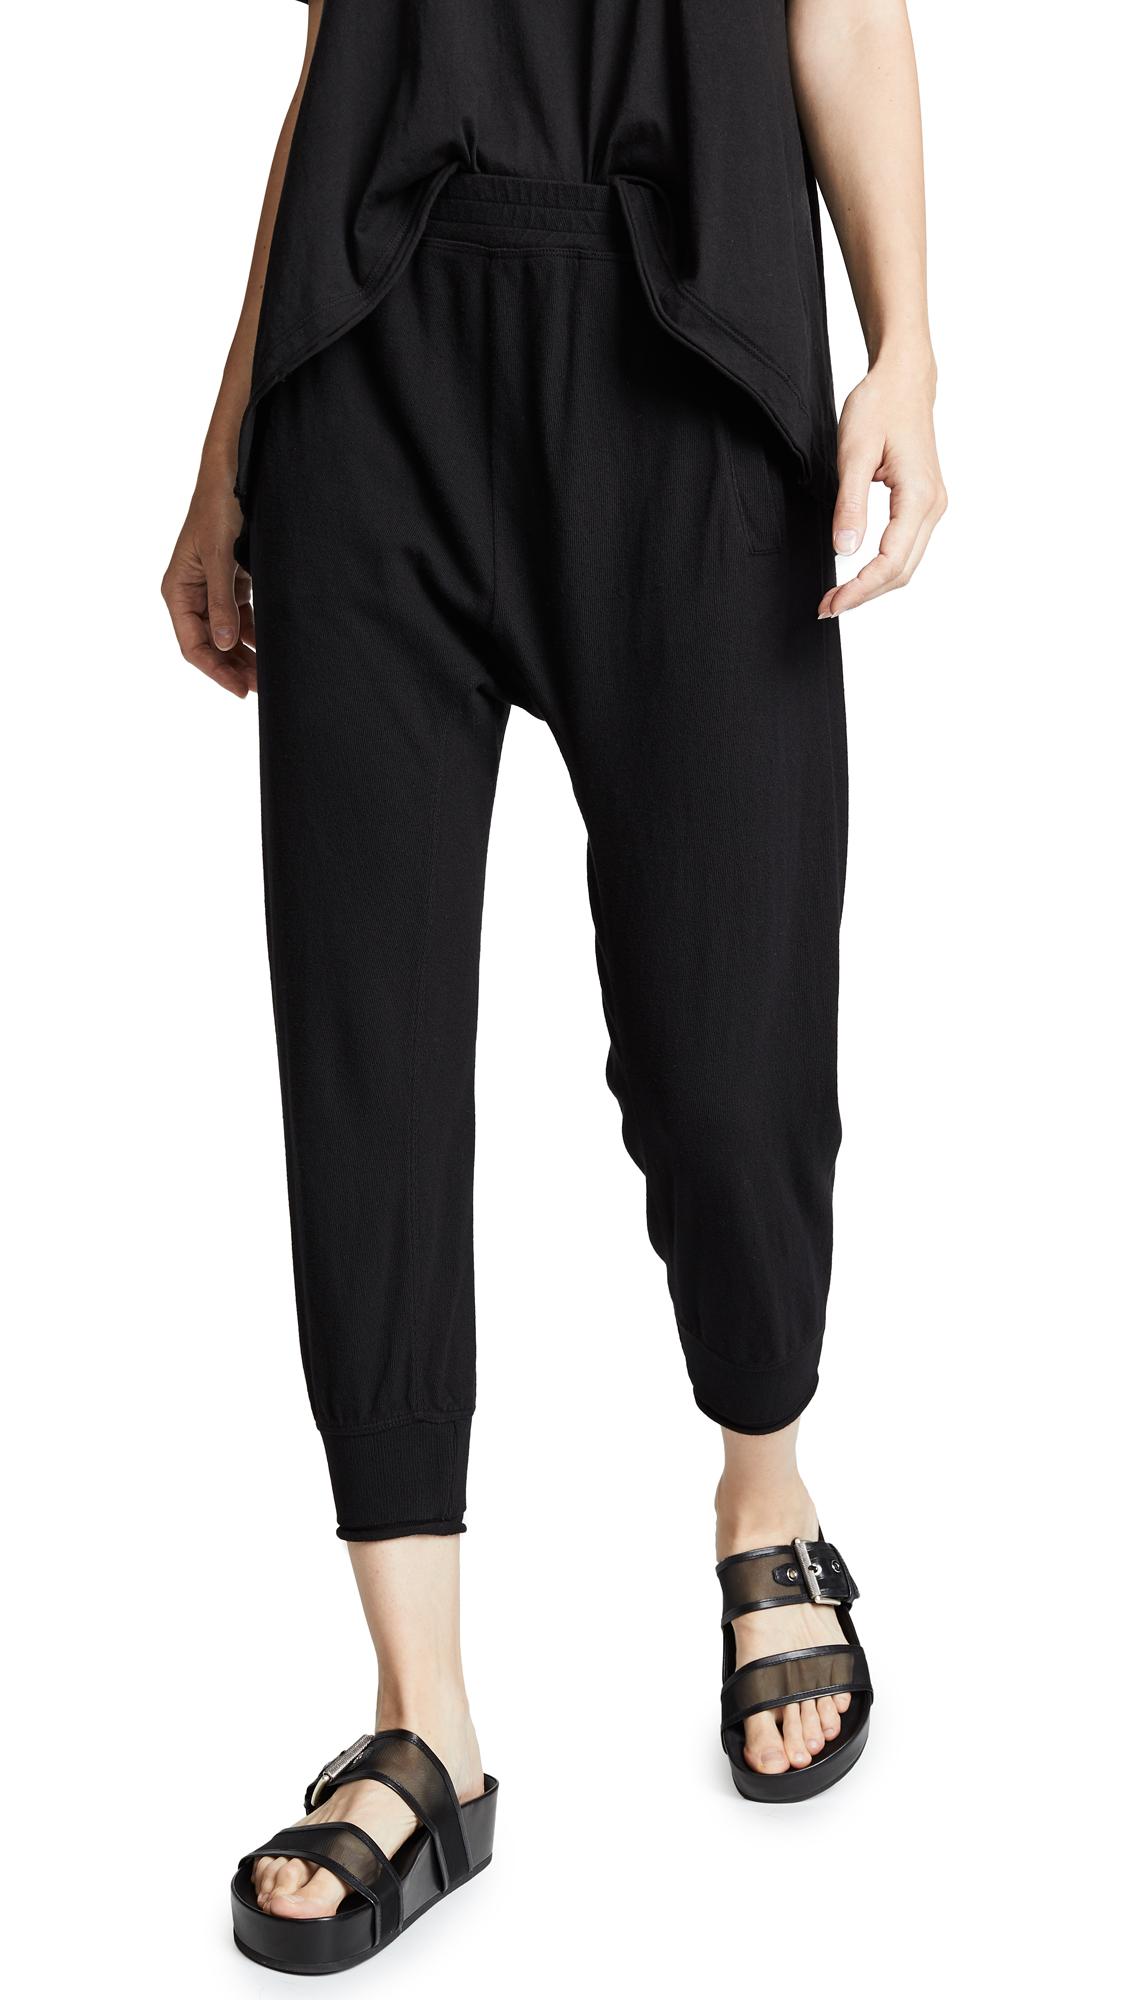 WILT Shrunken Sweatpants W Rolled Rib Cuff in Black